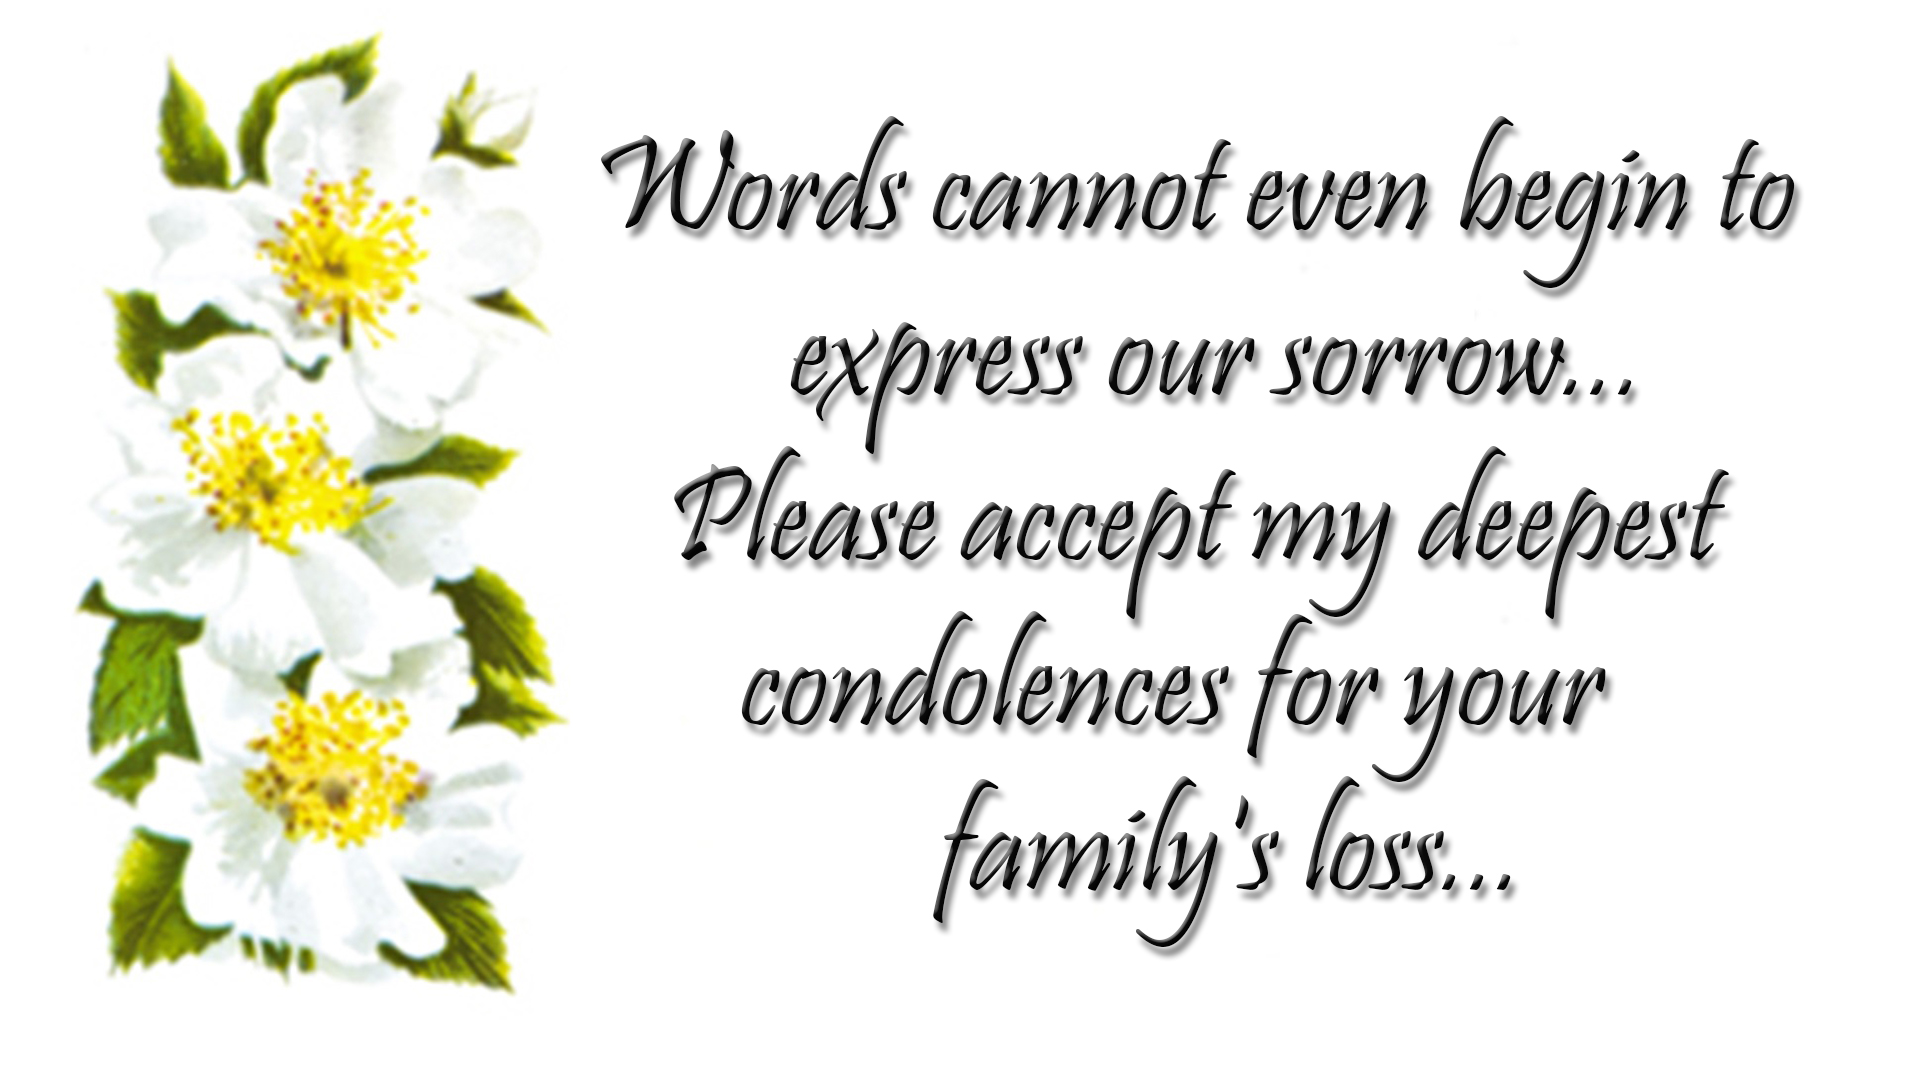 Condolences Quotes | Condolences Quotes Sympathy Messages Images Free Download